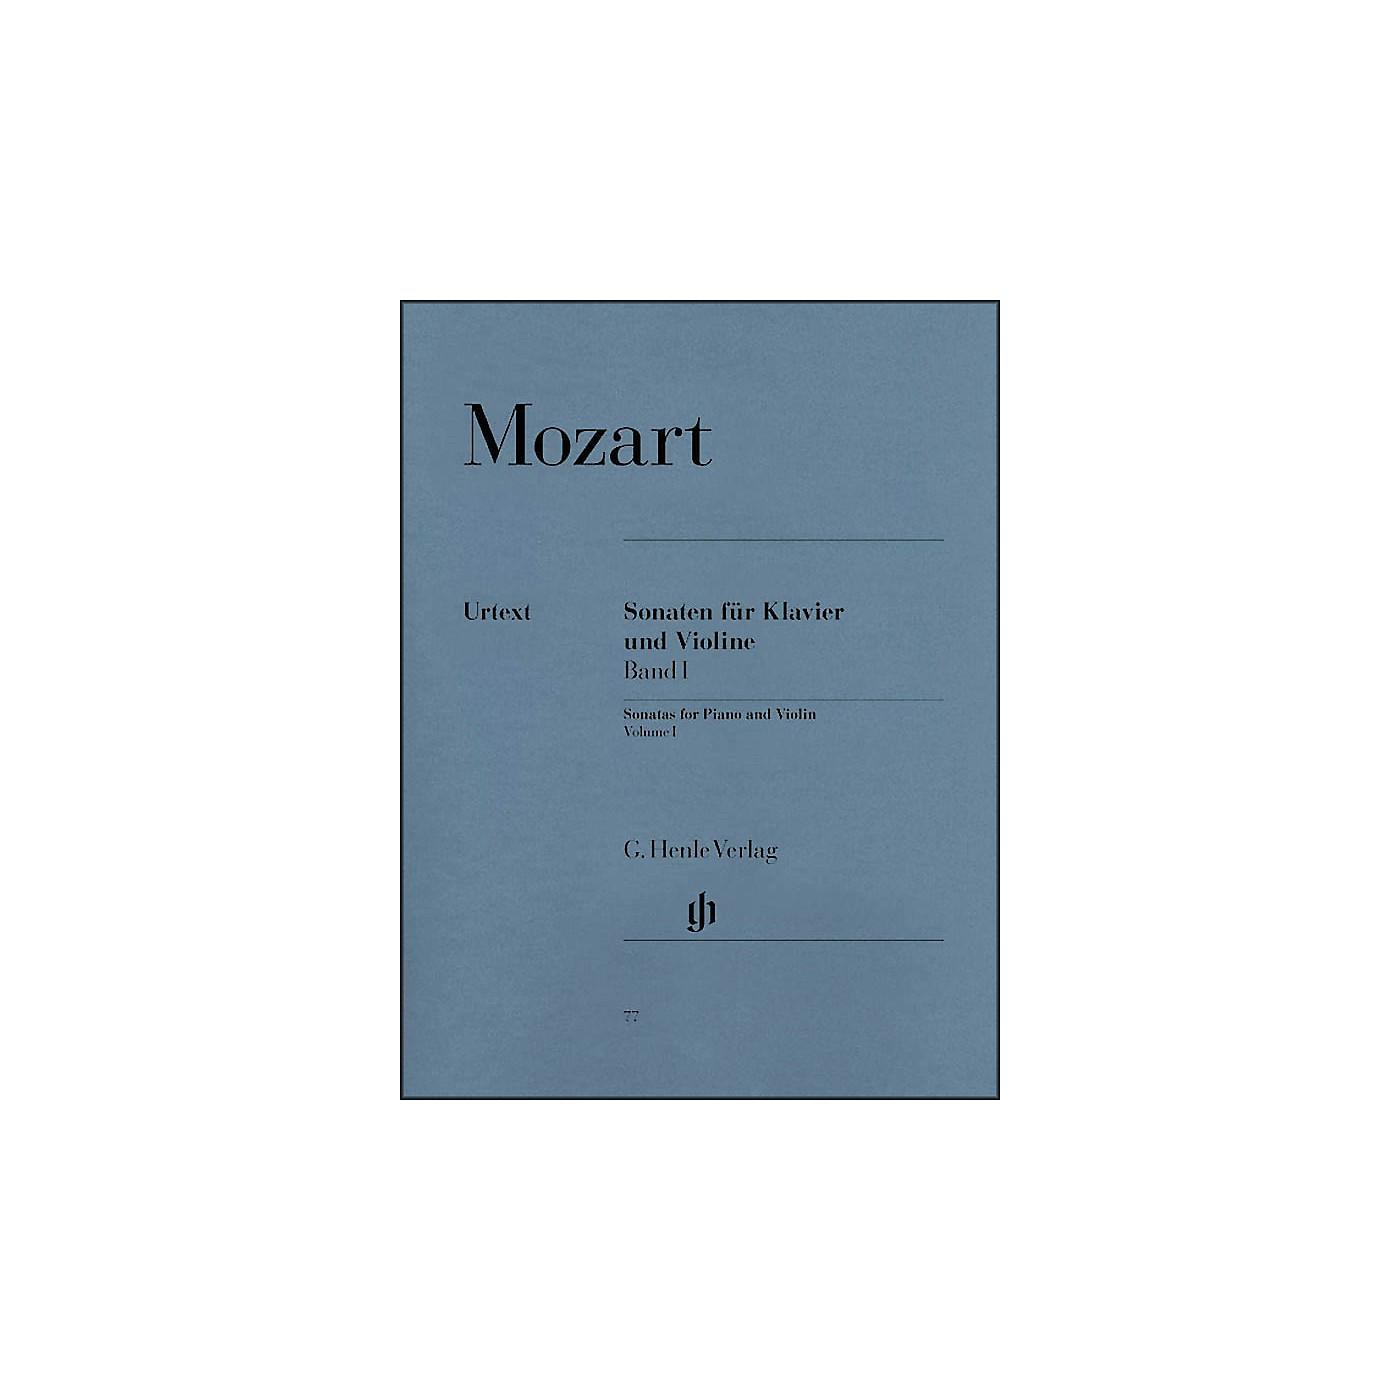 G. Henle Verlag Sonatas for Piano And Violin Volume I By Mozart thumbnail